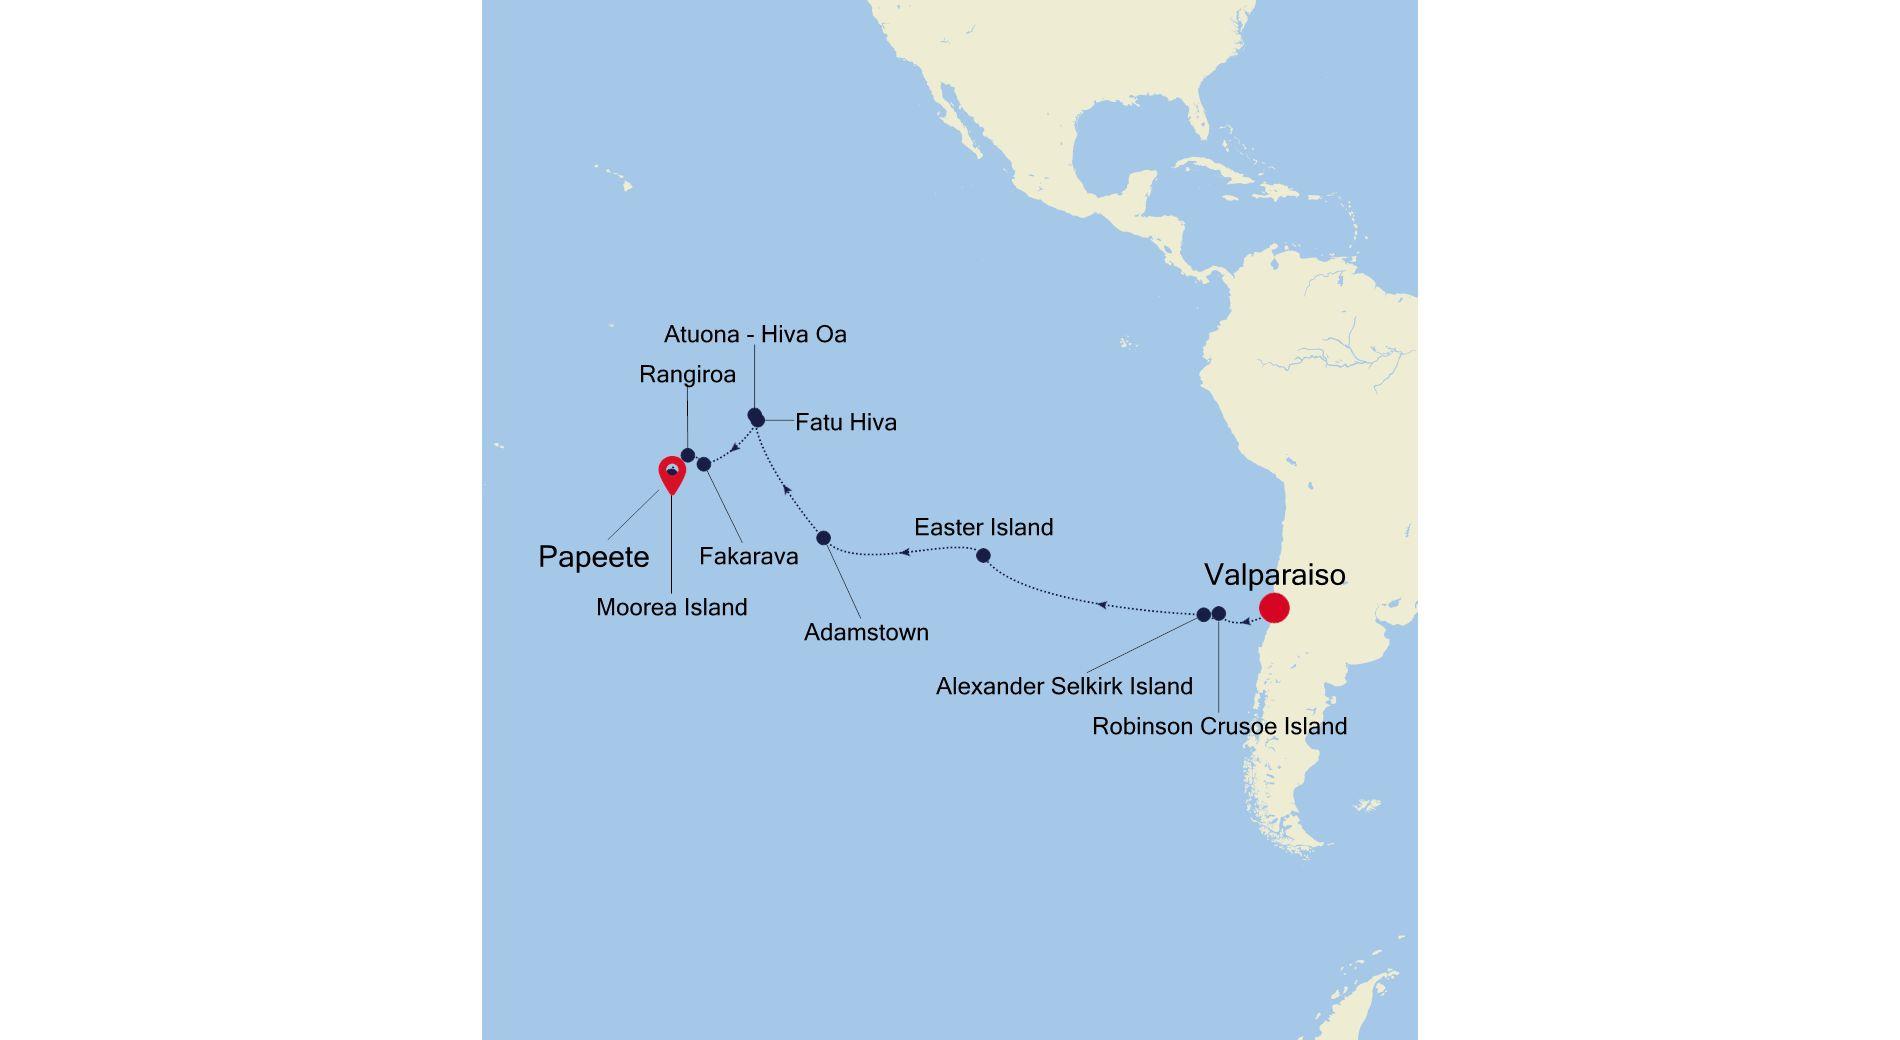 E4220212022 - Valparaiso a Papeete